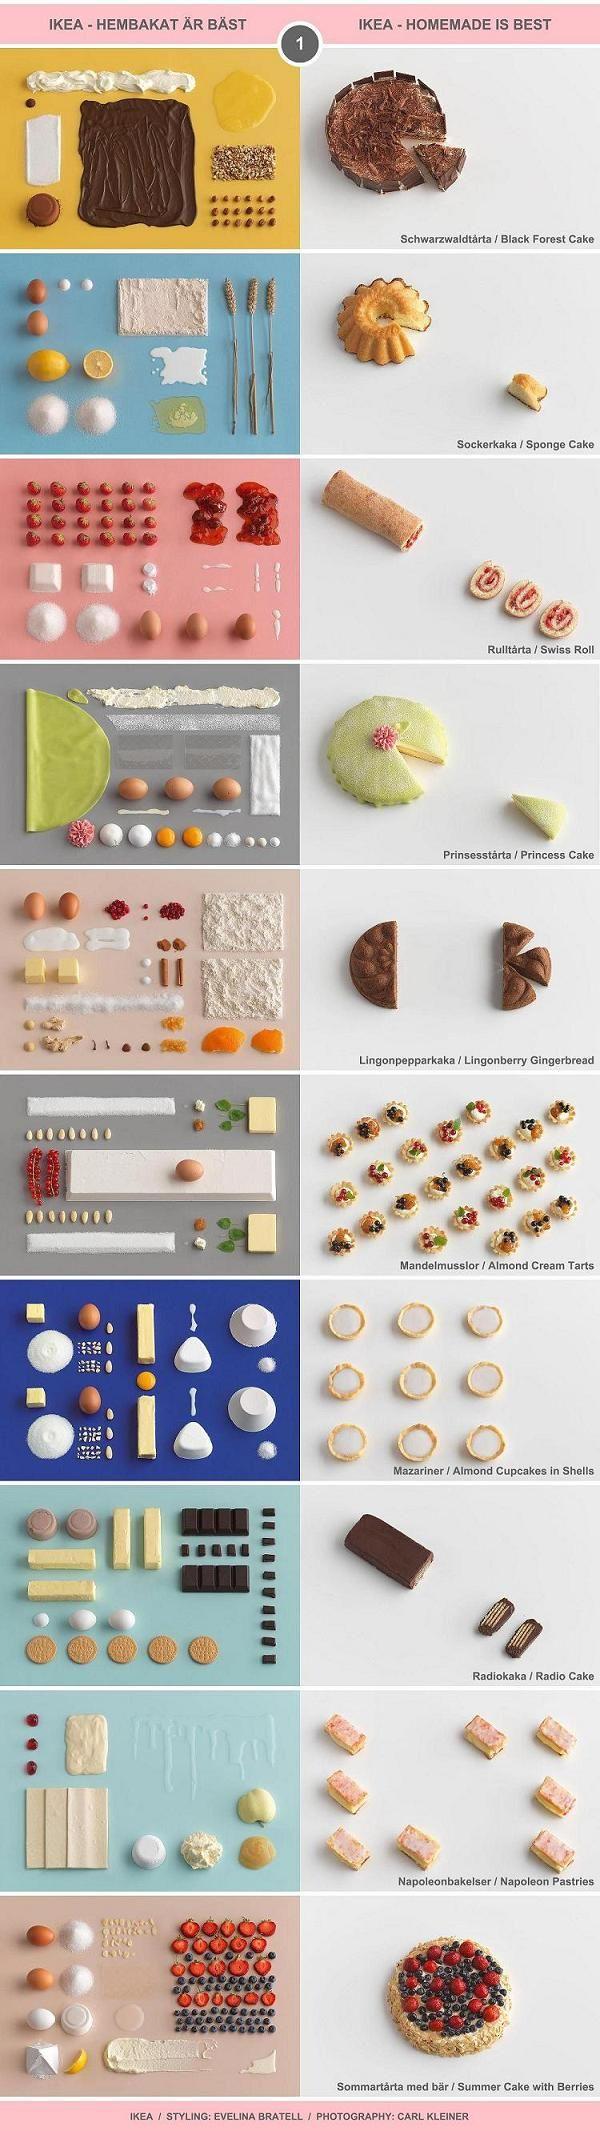 "10 Classic Swedish Treats (I) - IKEA cookbook ""Hembakat är Bäst"" (Homemade Is Best) / Food Styling by Evelina Bratell, Photos by Carl Kleiner (http://www.carlkleiner.com)"